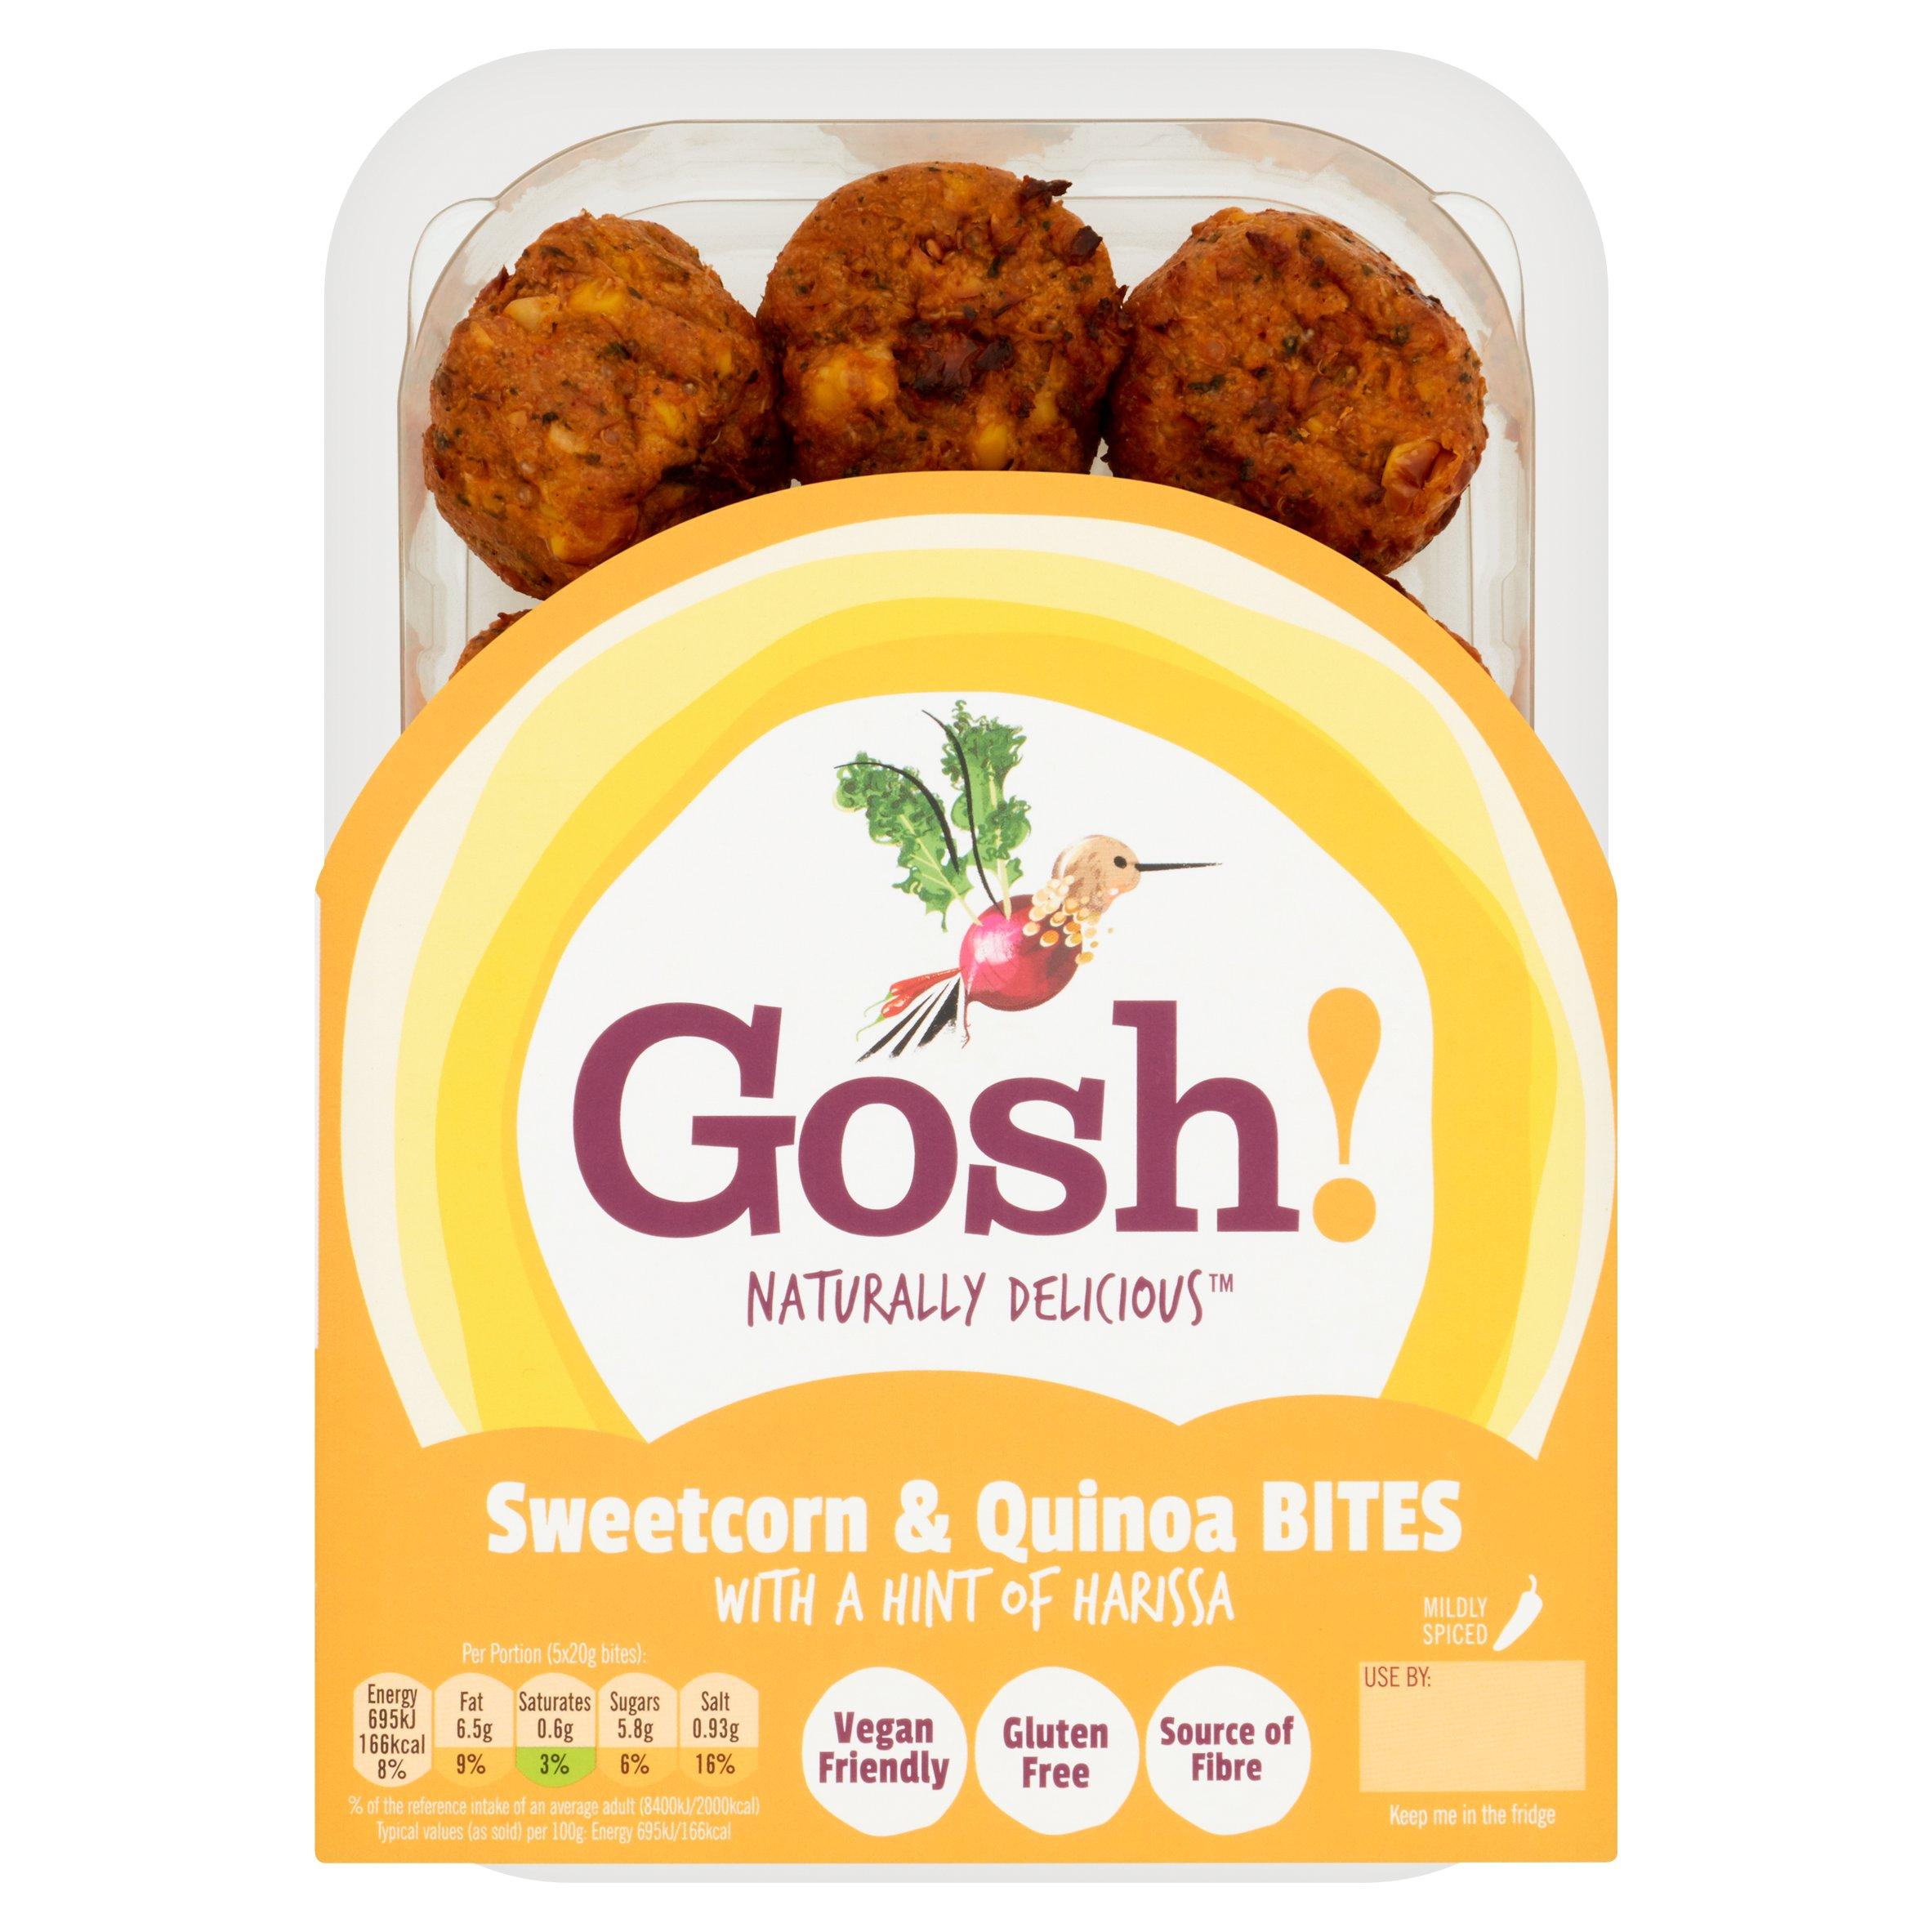 Gosh! Sweetcorn & Quinoa Bites 280G